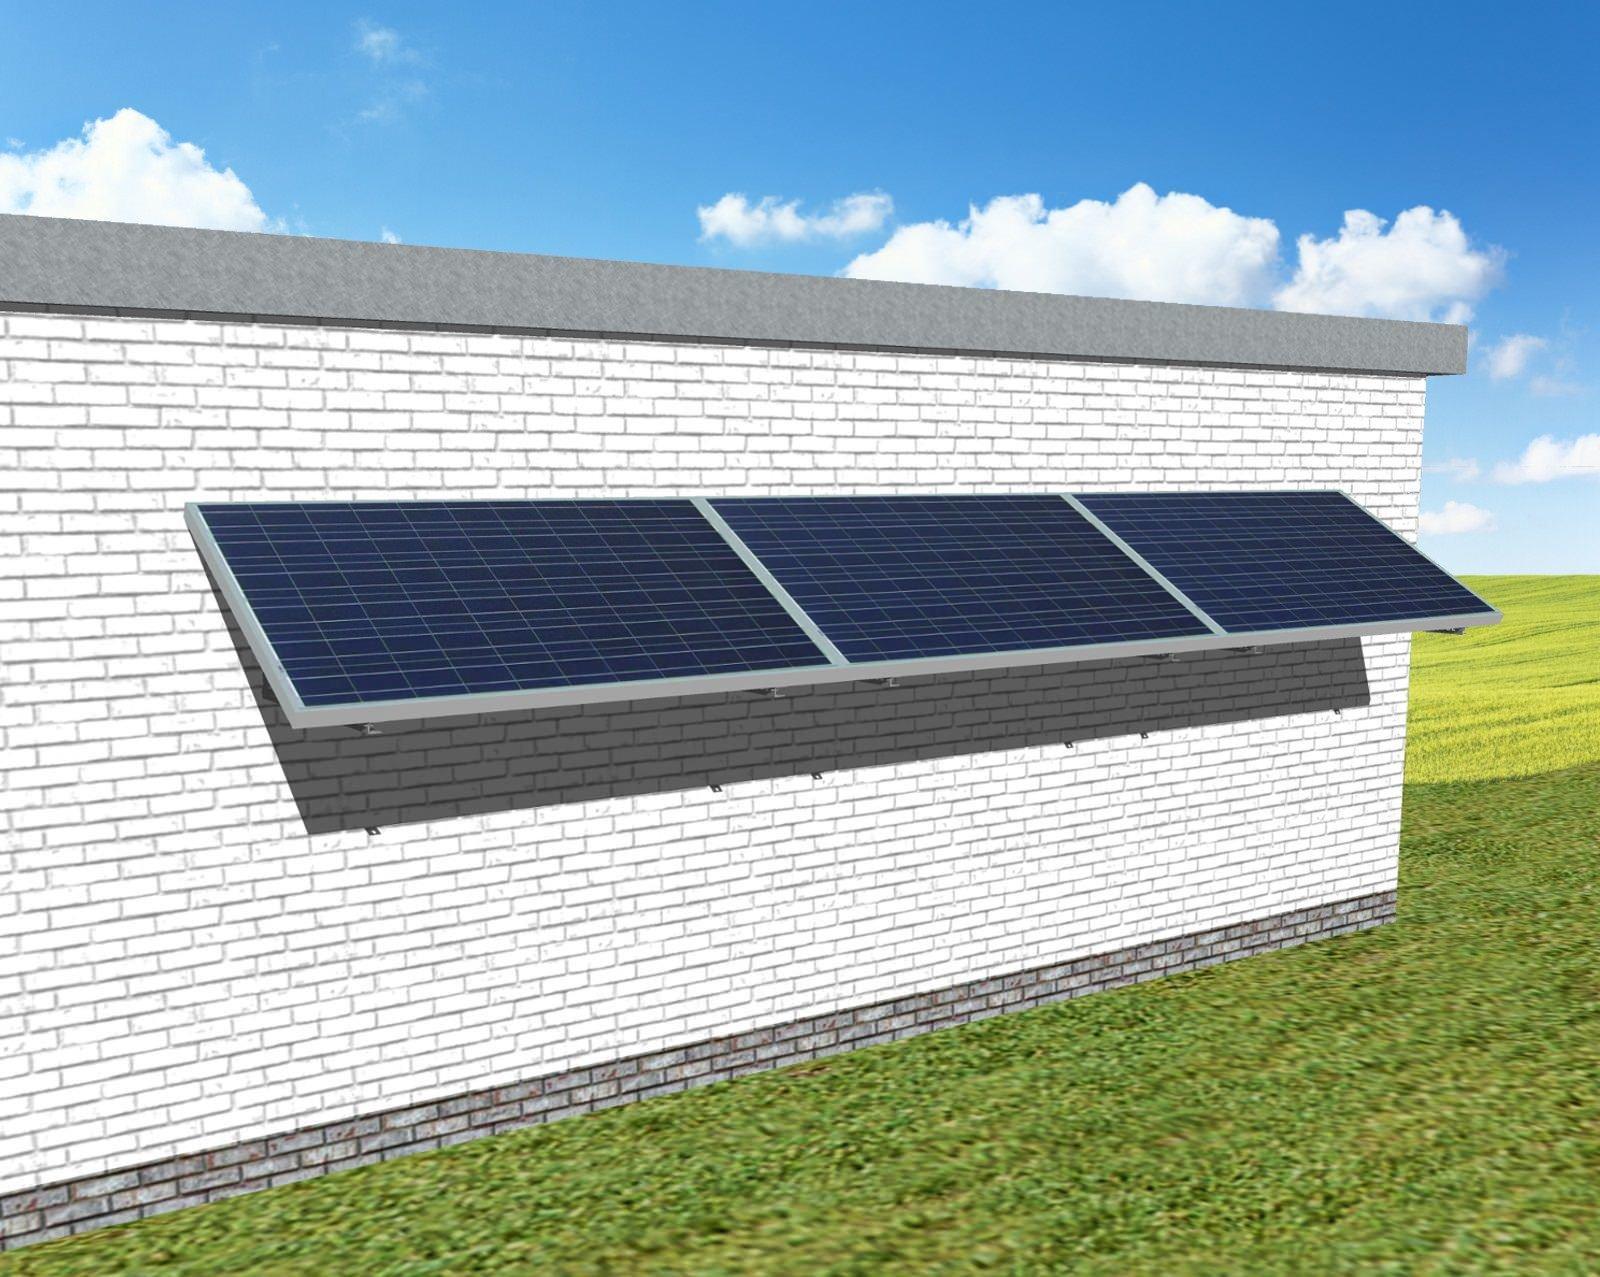 "myCleantech-Solar.org™ - Komplett Solaranlage Fassade 810 - 6'168 WattP ""Einfache Selbstmontage - do it yourself"" oder Aufbau durch unsere Fachleute ab... K20180715-02 - Let's developp your renewable project togheter"